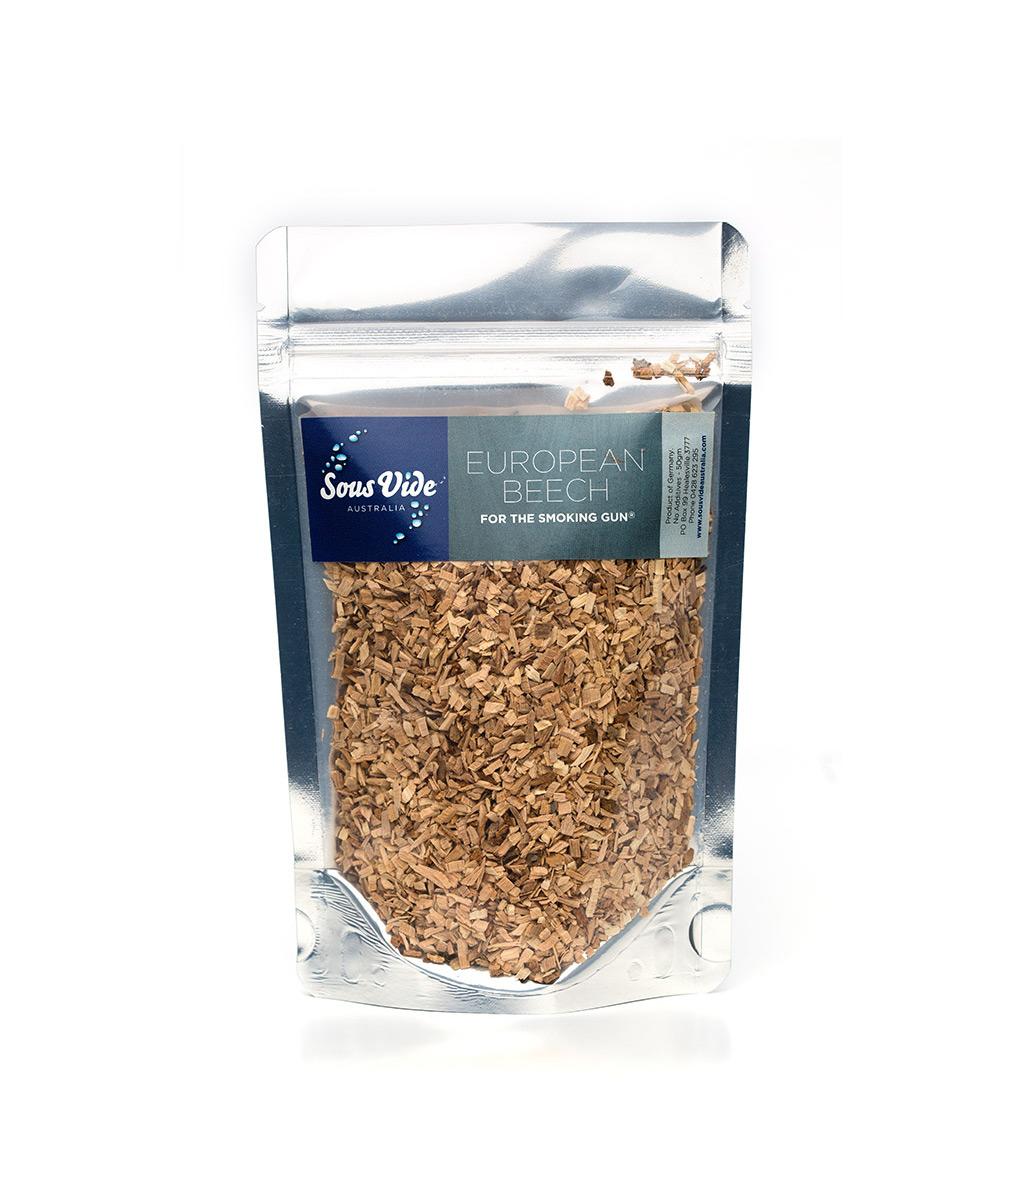 Wood chips – European Beech for The Smoking Gun wood smoker 50g Food Smoker